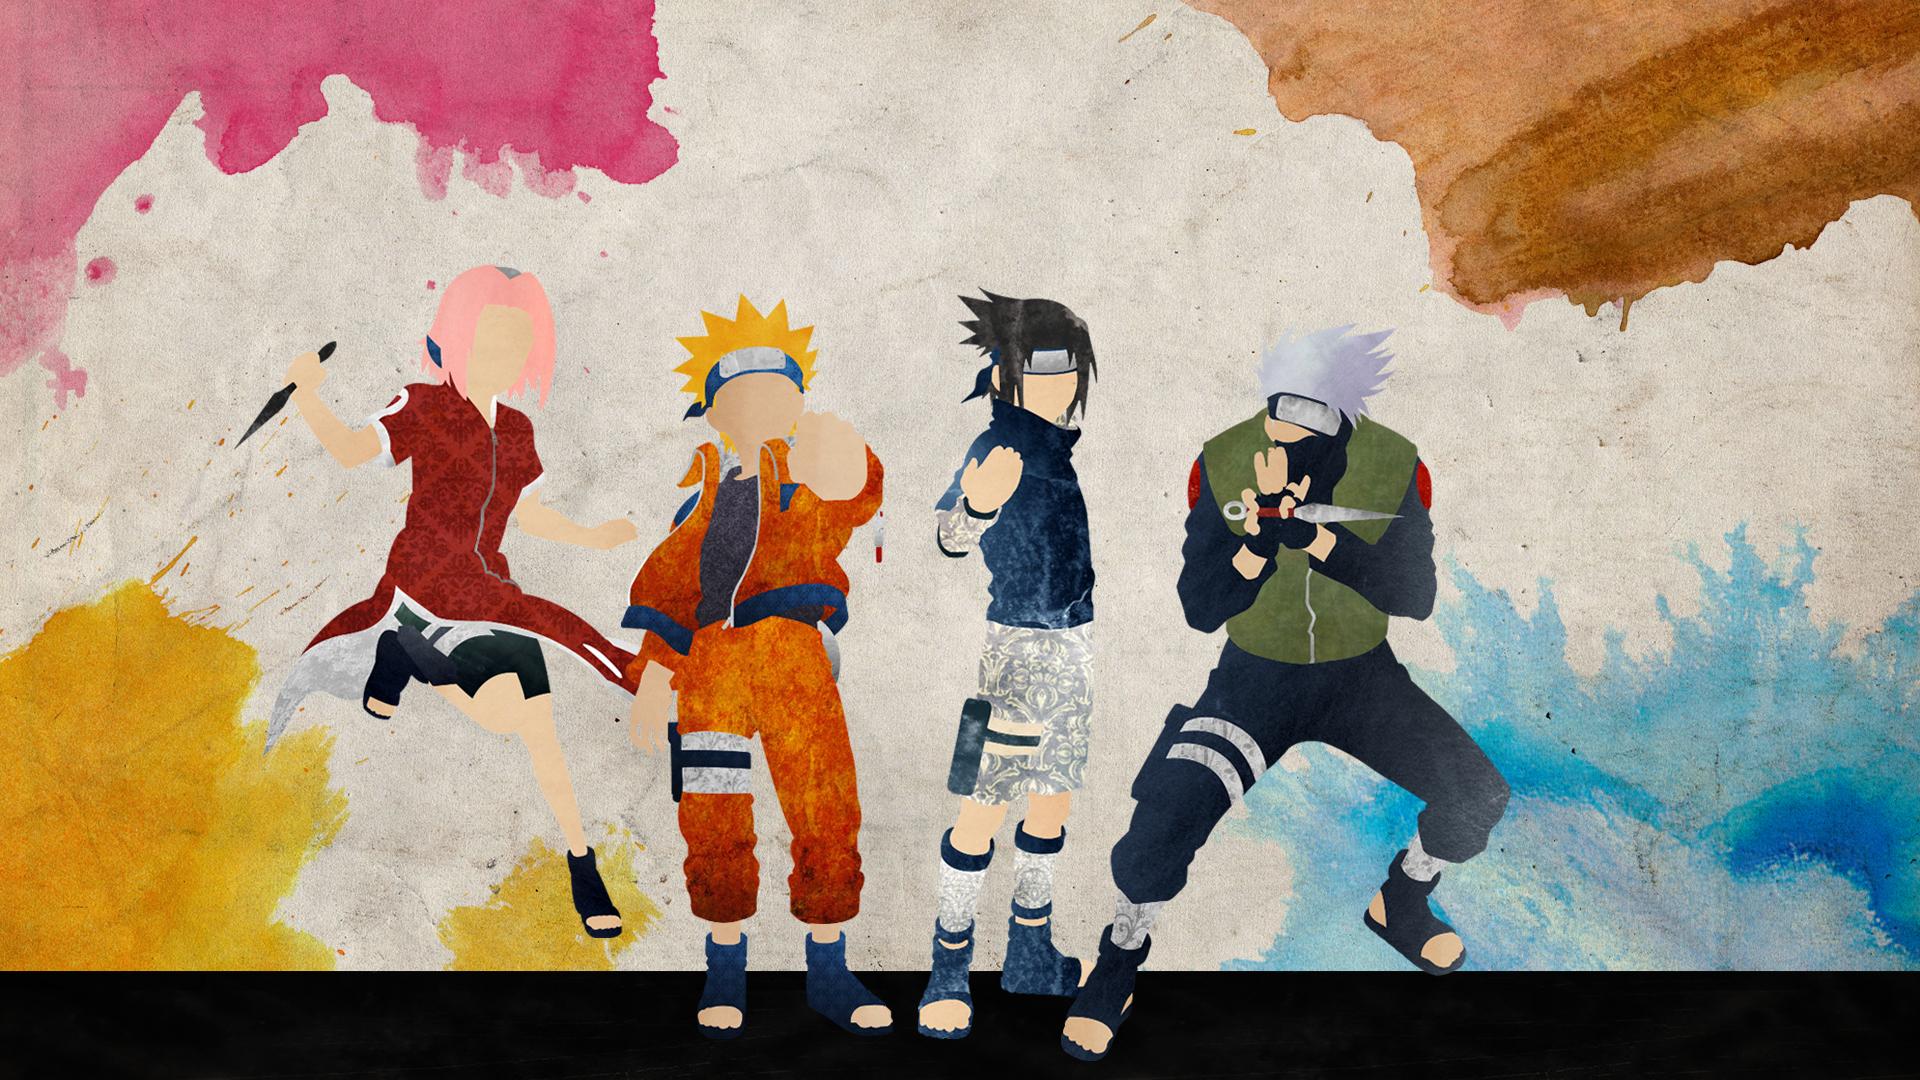 Wonderful Wallpaper Naruto Minimalistic - team_7___naruto_by_doubleu42-d7rg4uw  You Should Have_239971.jpg